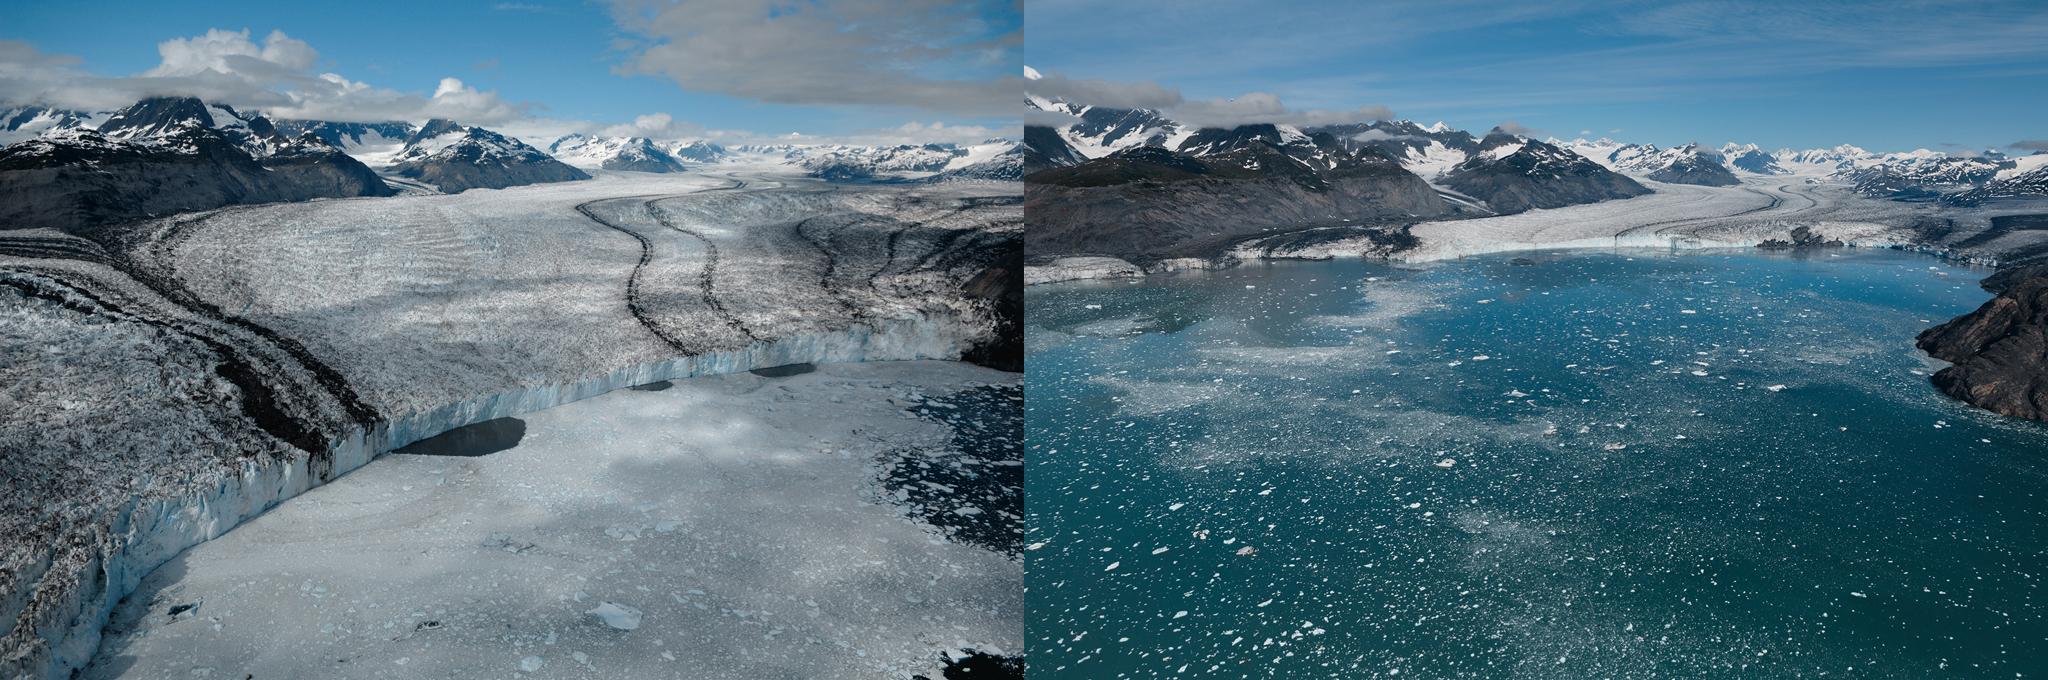 Courtesy of Balog: Columbia Glacier, Alaska from 2006 to 2012